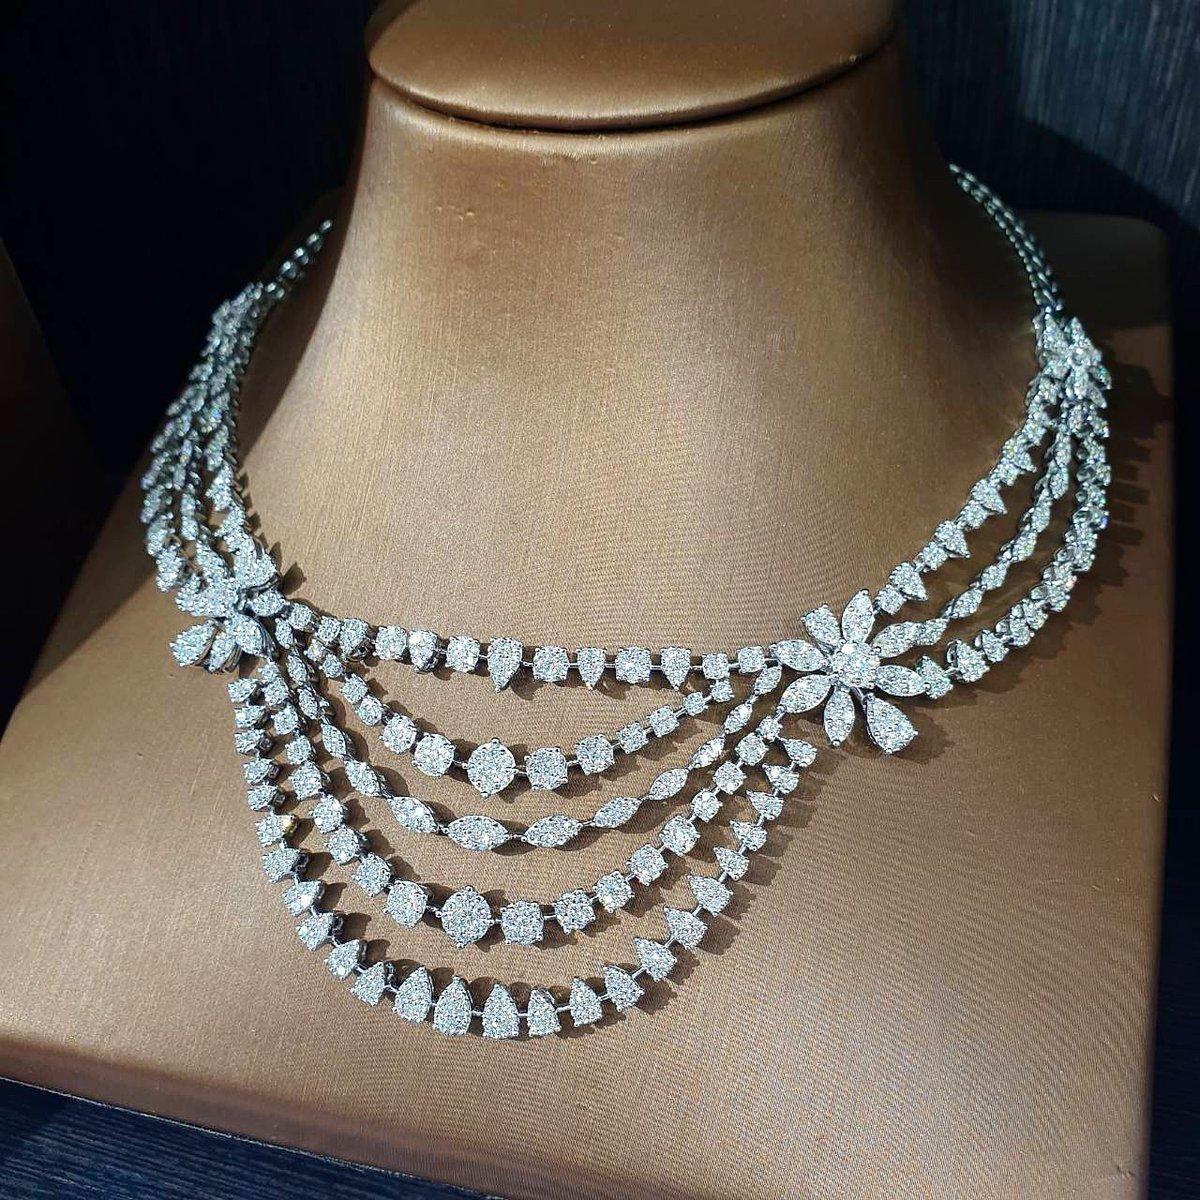 Diamond Necklace D coler  #diamondbracelet  #luxuryjewelry #finejewelry #Petchchompoojewelry #เพชร #เพชรแท้ #เพชรชมพูจิวเวลรี่ #สร้อยคอเพชรระย้า #สร้อยคอเพชร #diamonds #diamondnecklacespic.twitter.com/stWuZszdvZ